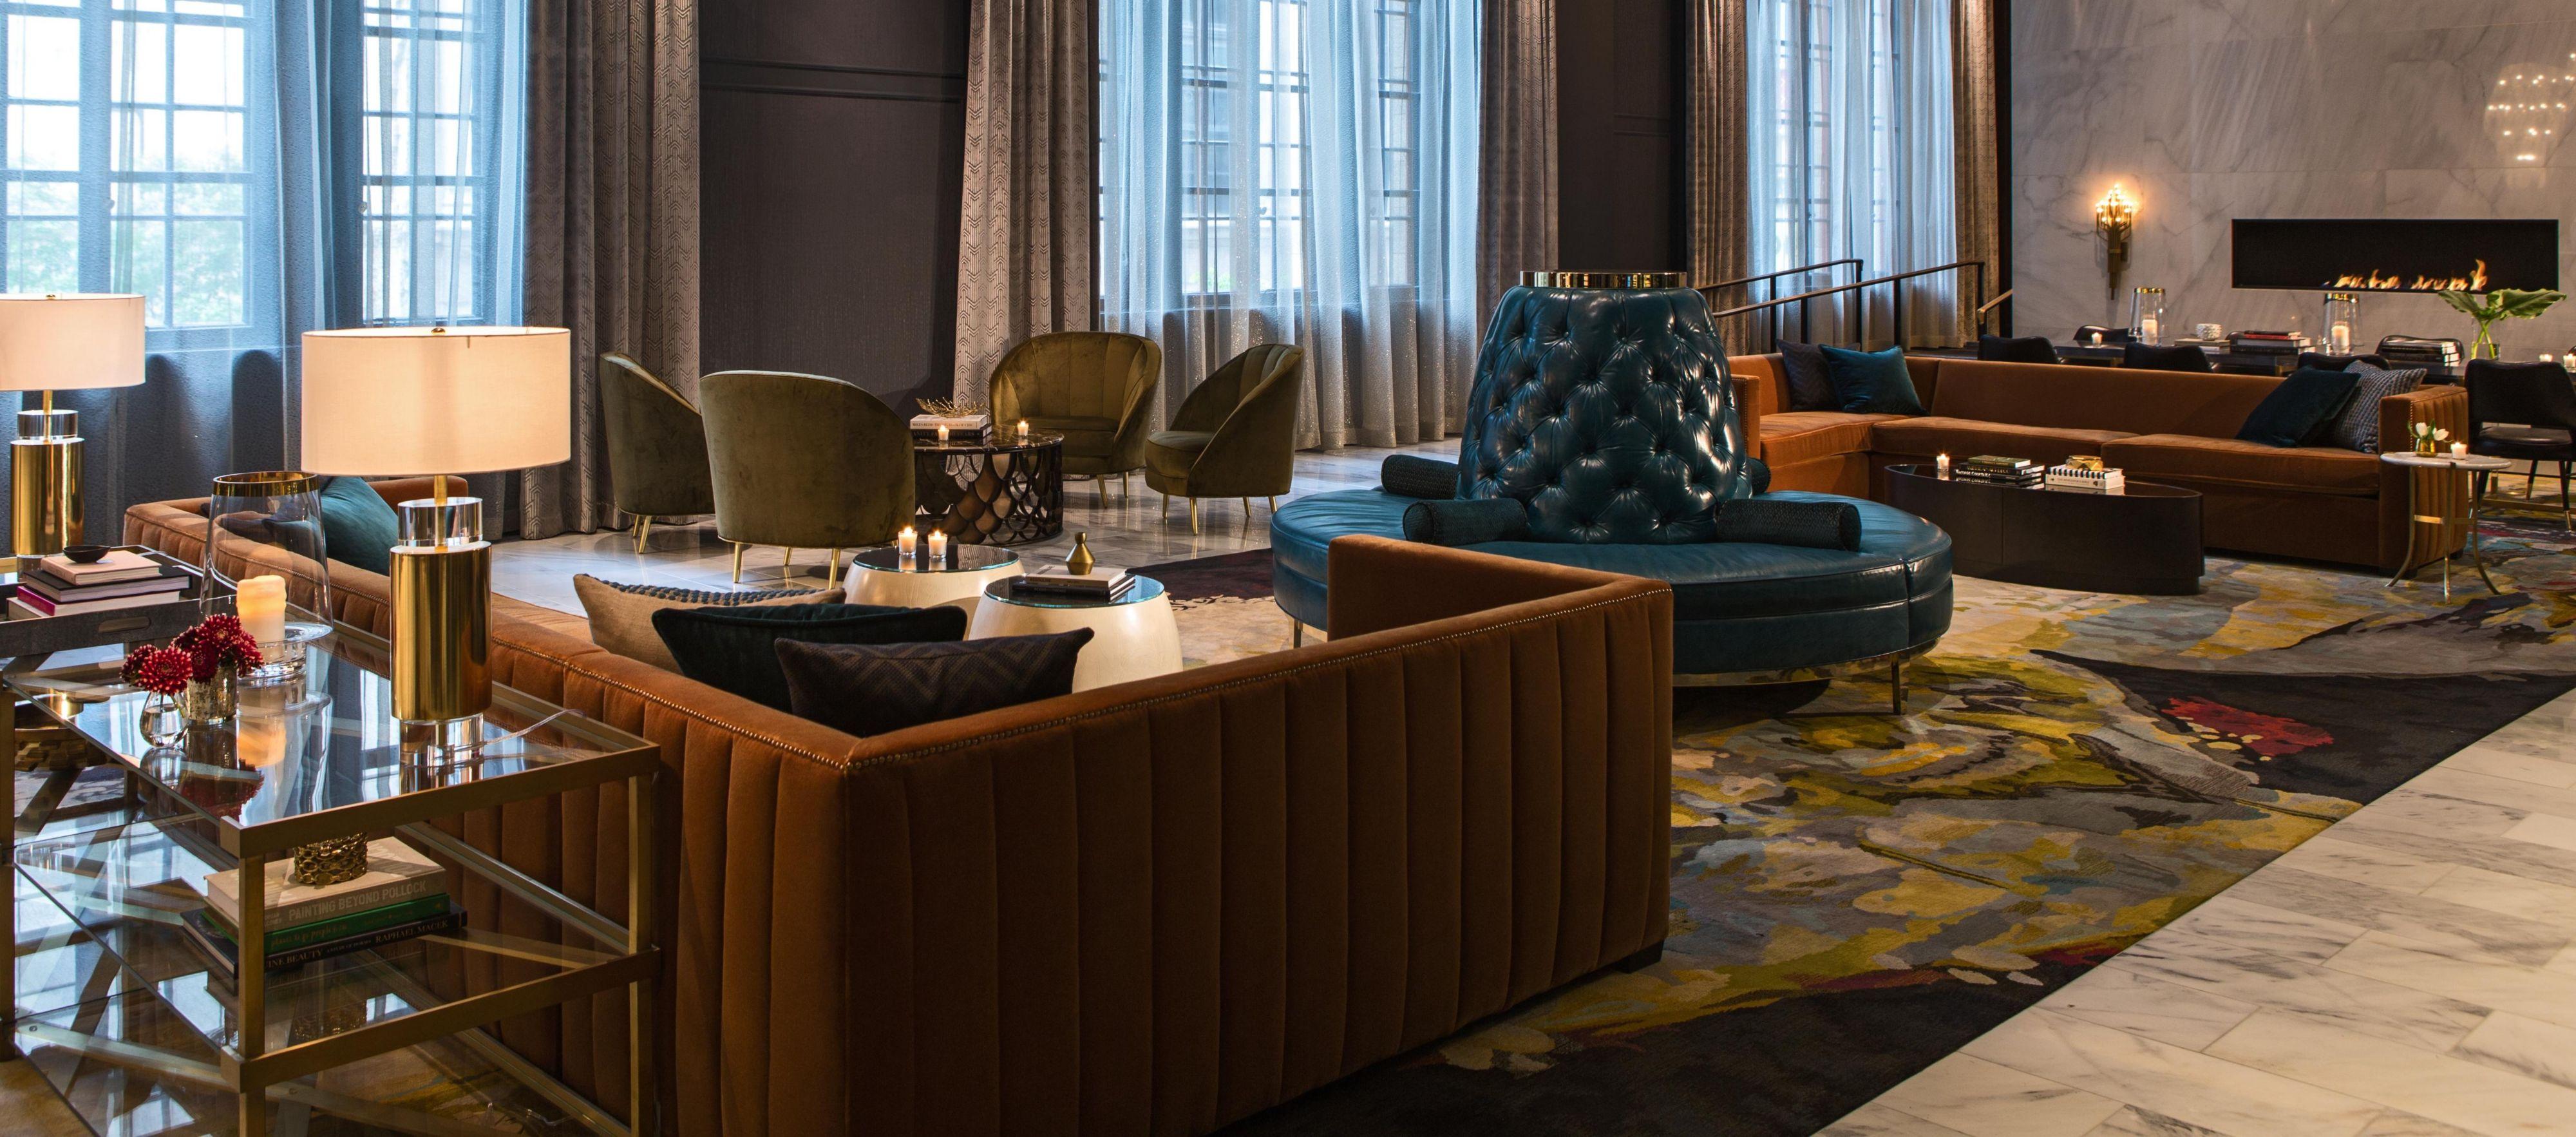 Kimpton Hotel Allegro in Downtown Chicago | Kimpton Hotels